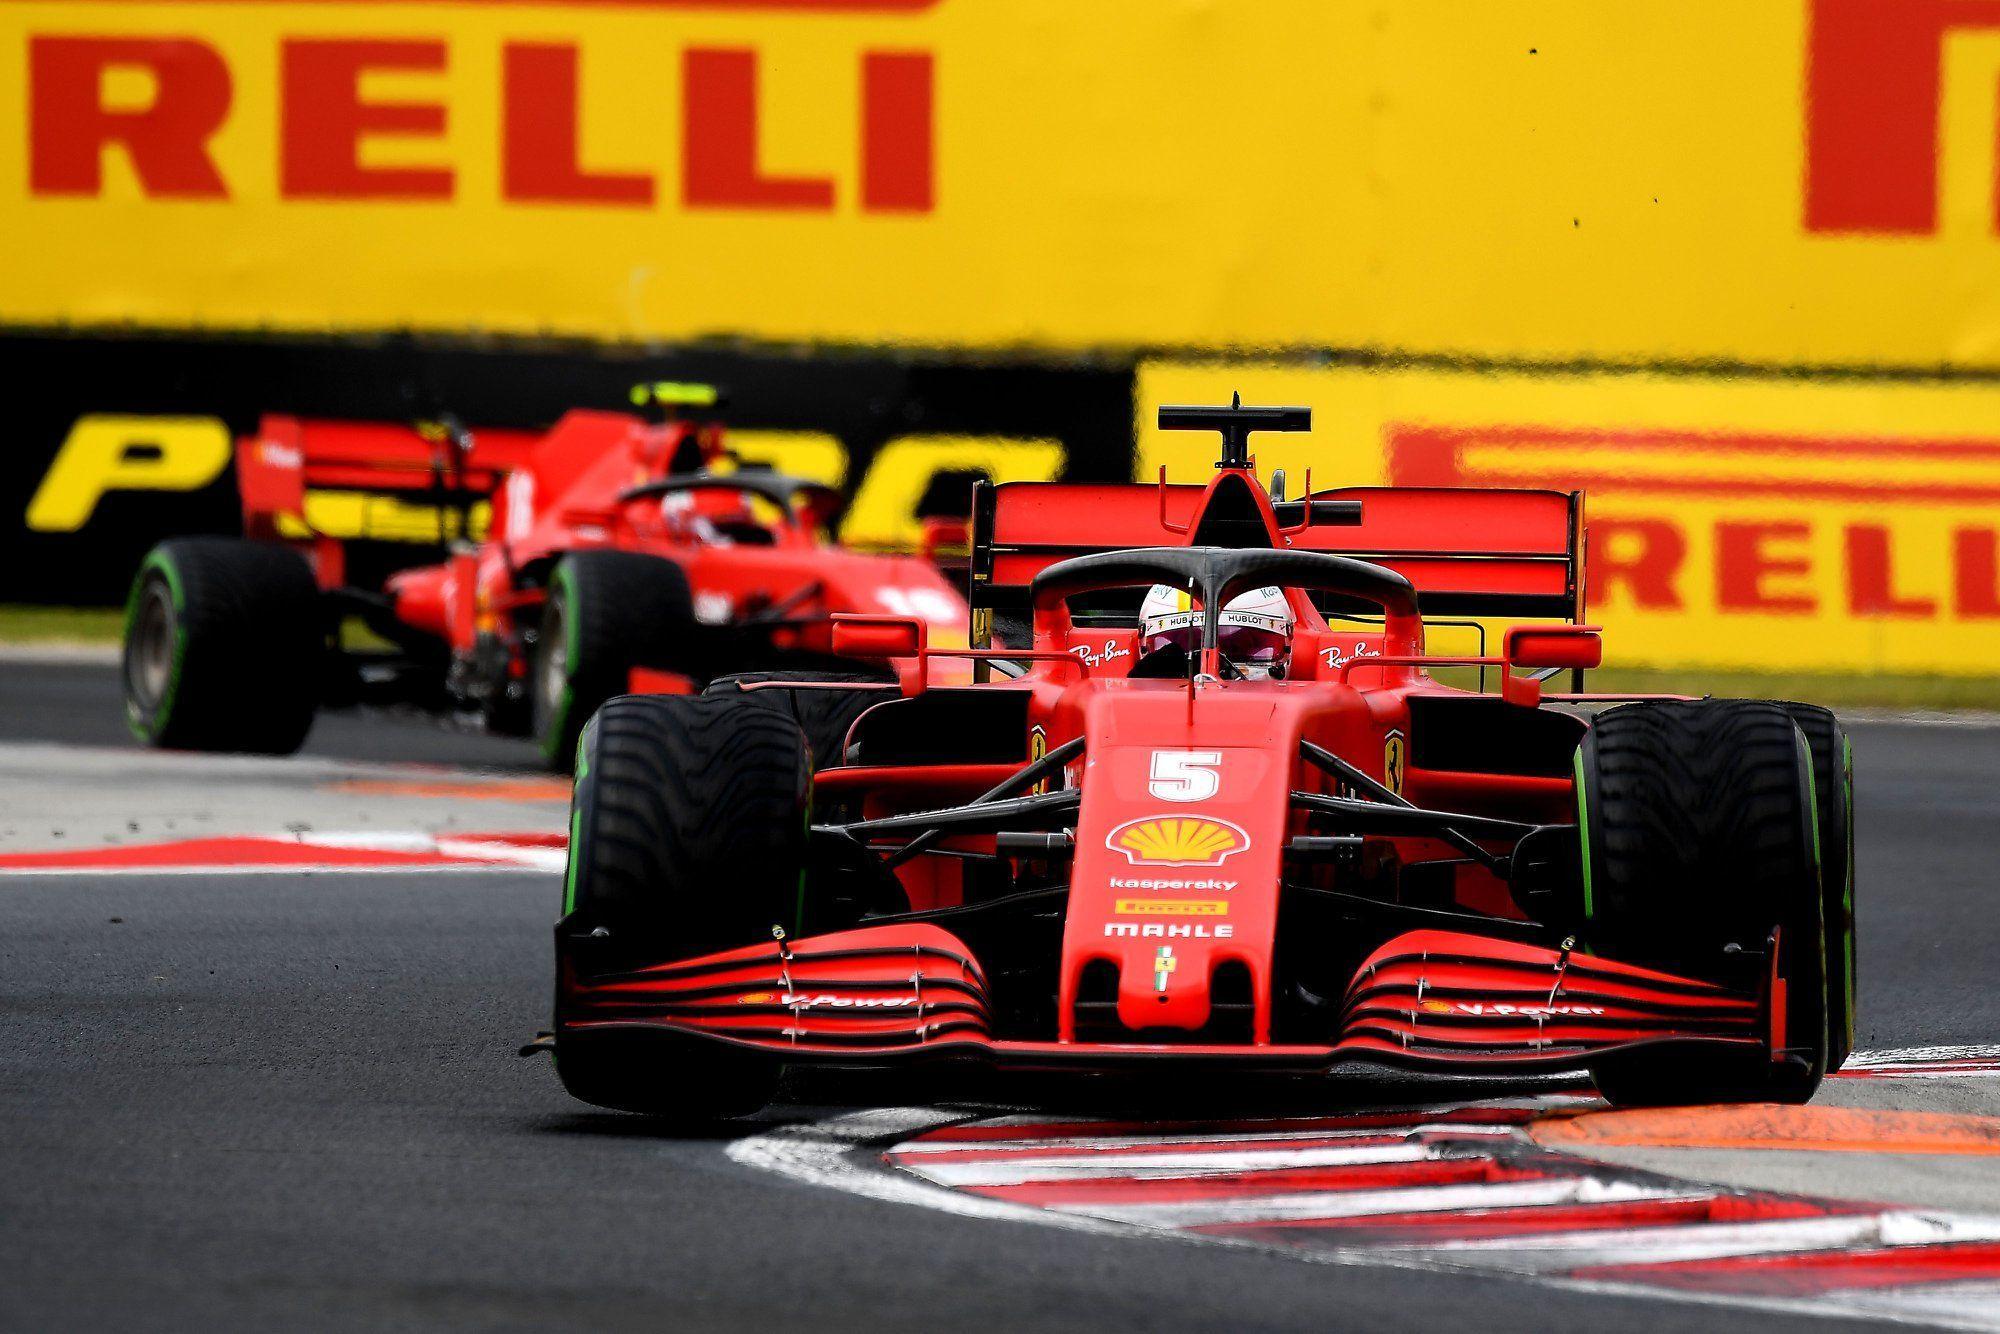 Elkann Opens Up On Ferrari Issues Drivers Binotto Hamilton S Call More